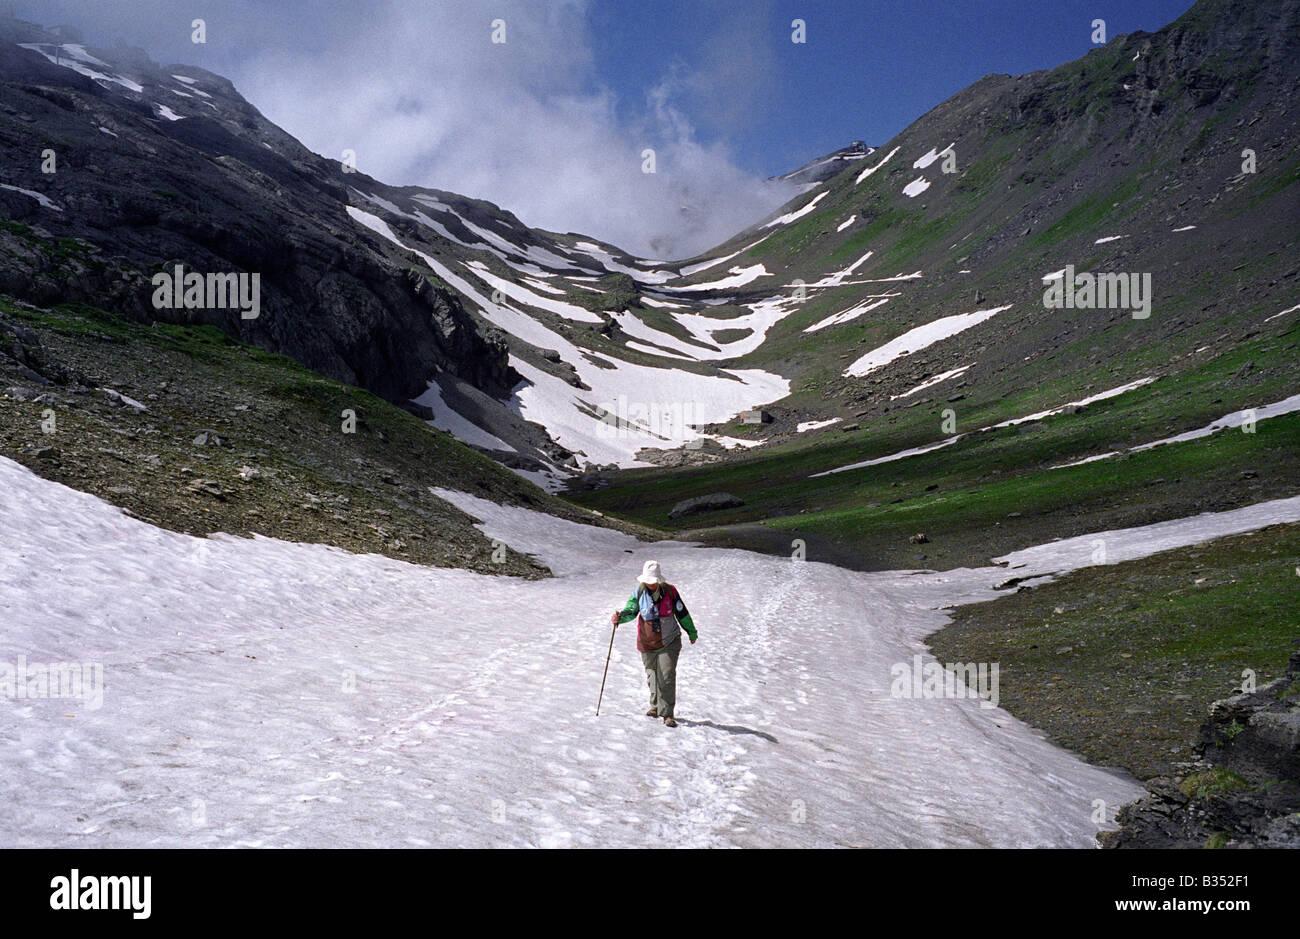 Switzerland berner oberland bernese oberland walking shilthorn mountain exercise energy safety - Stock Image